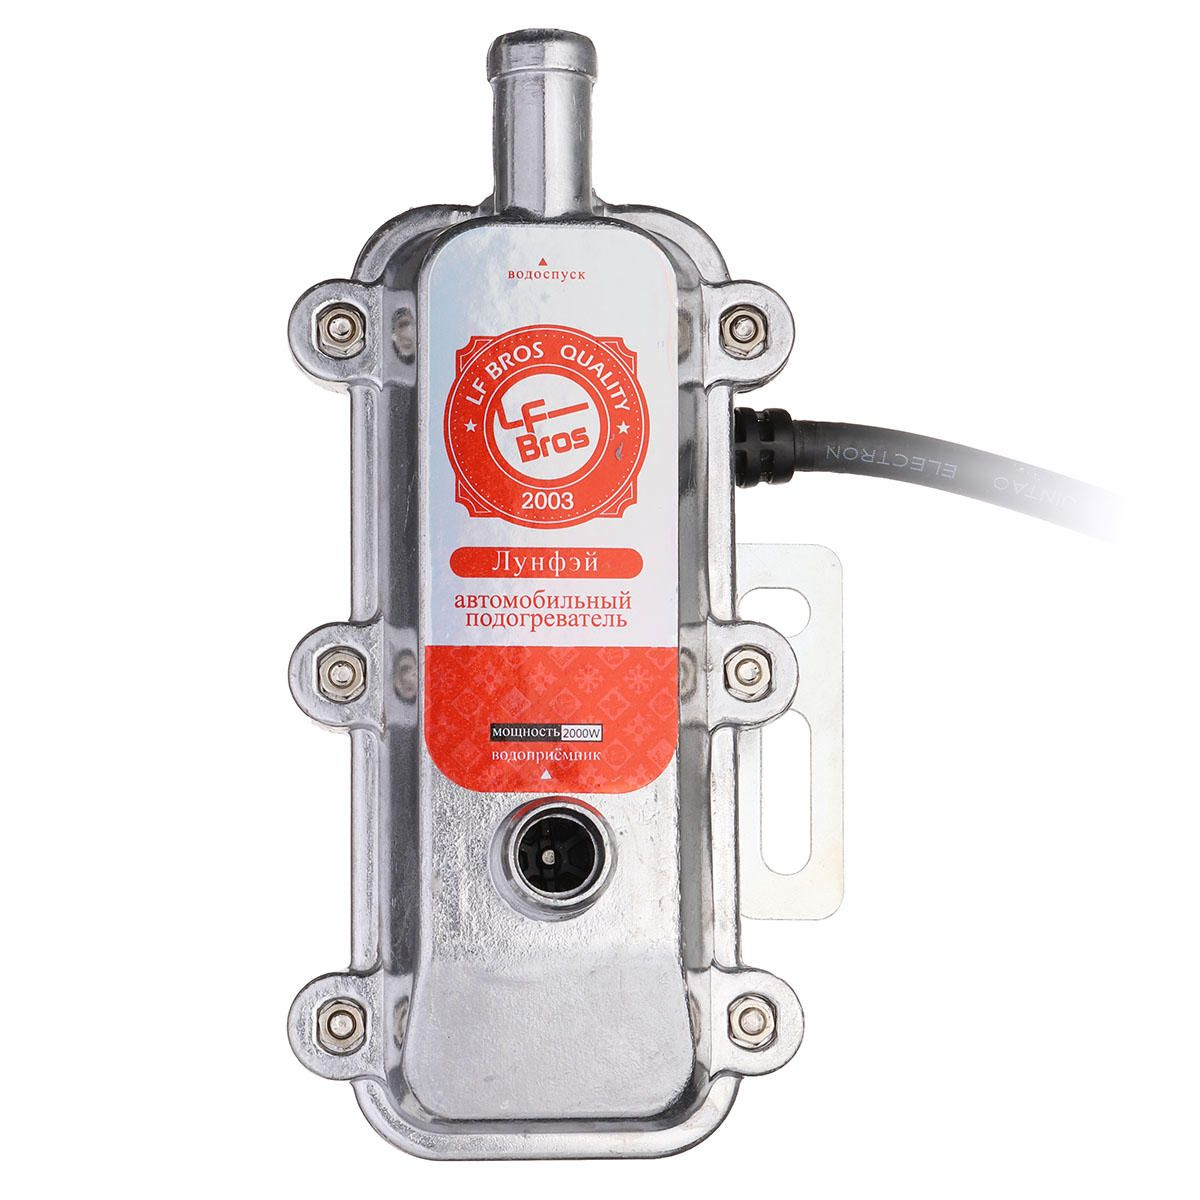 220V 2000W Car Engine Preheater Coolant Truck Air Parking Heater Kit EU Plug